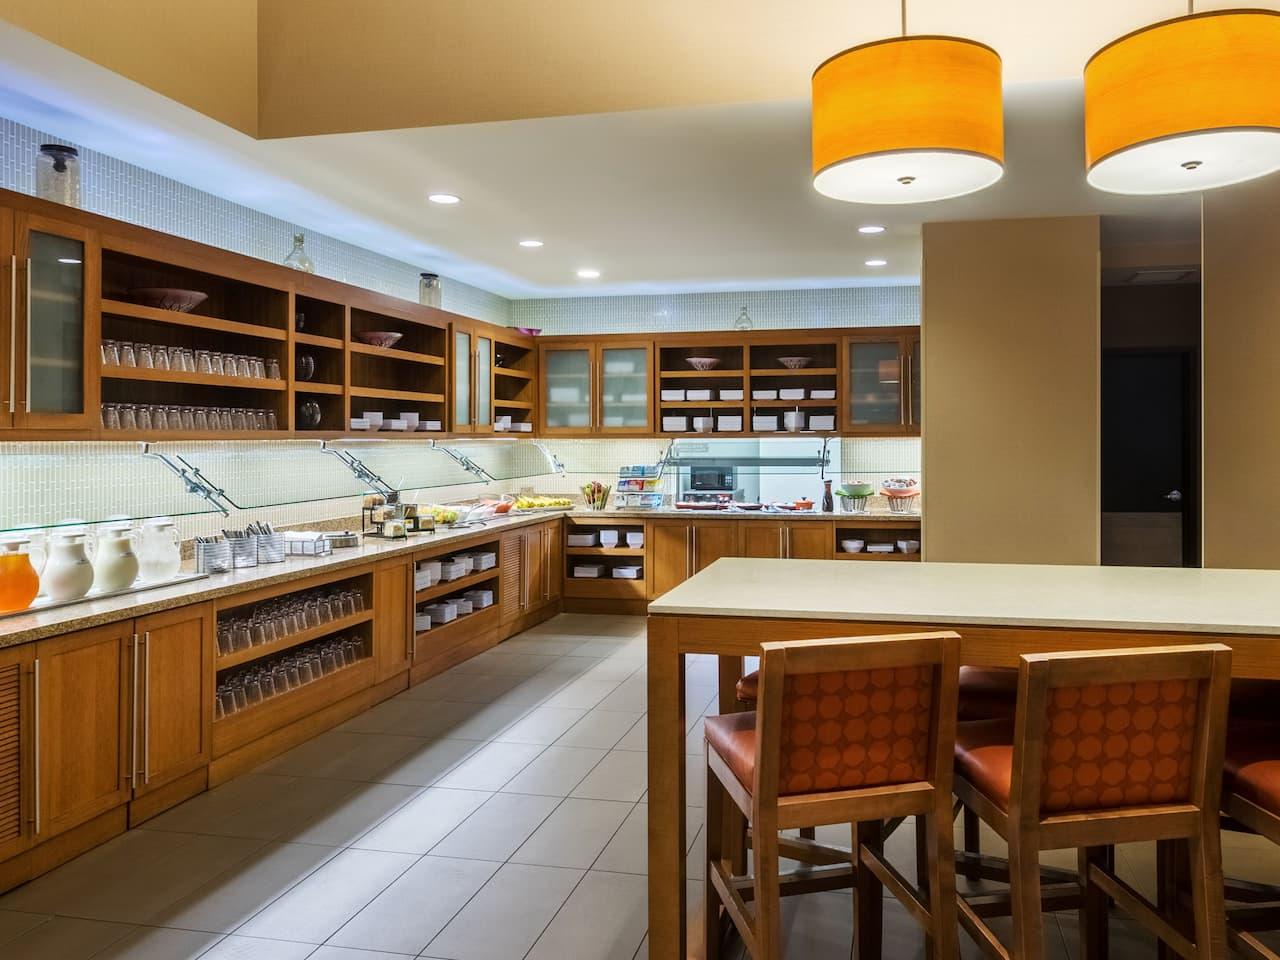 Hyatt Place Delray Beach Kitchen